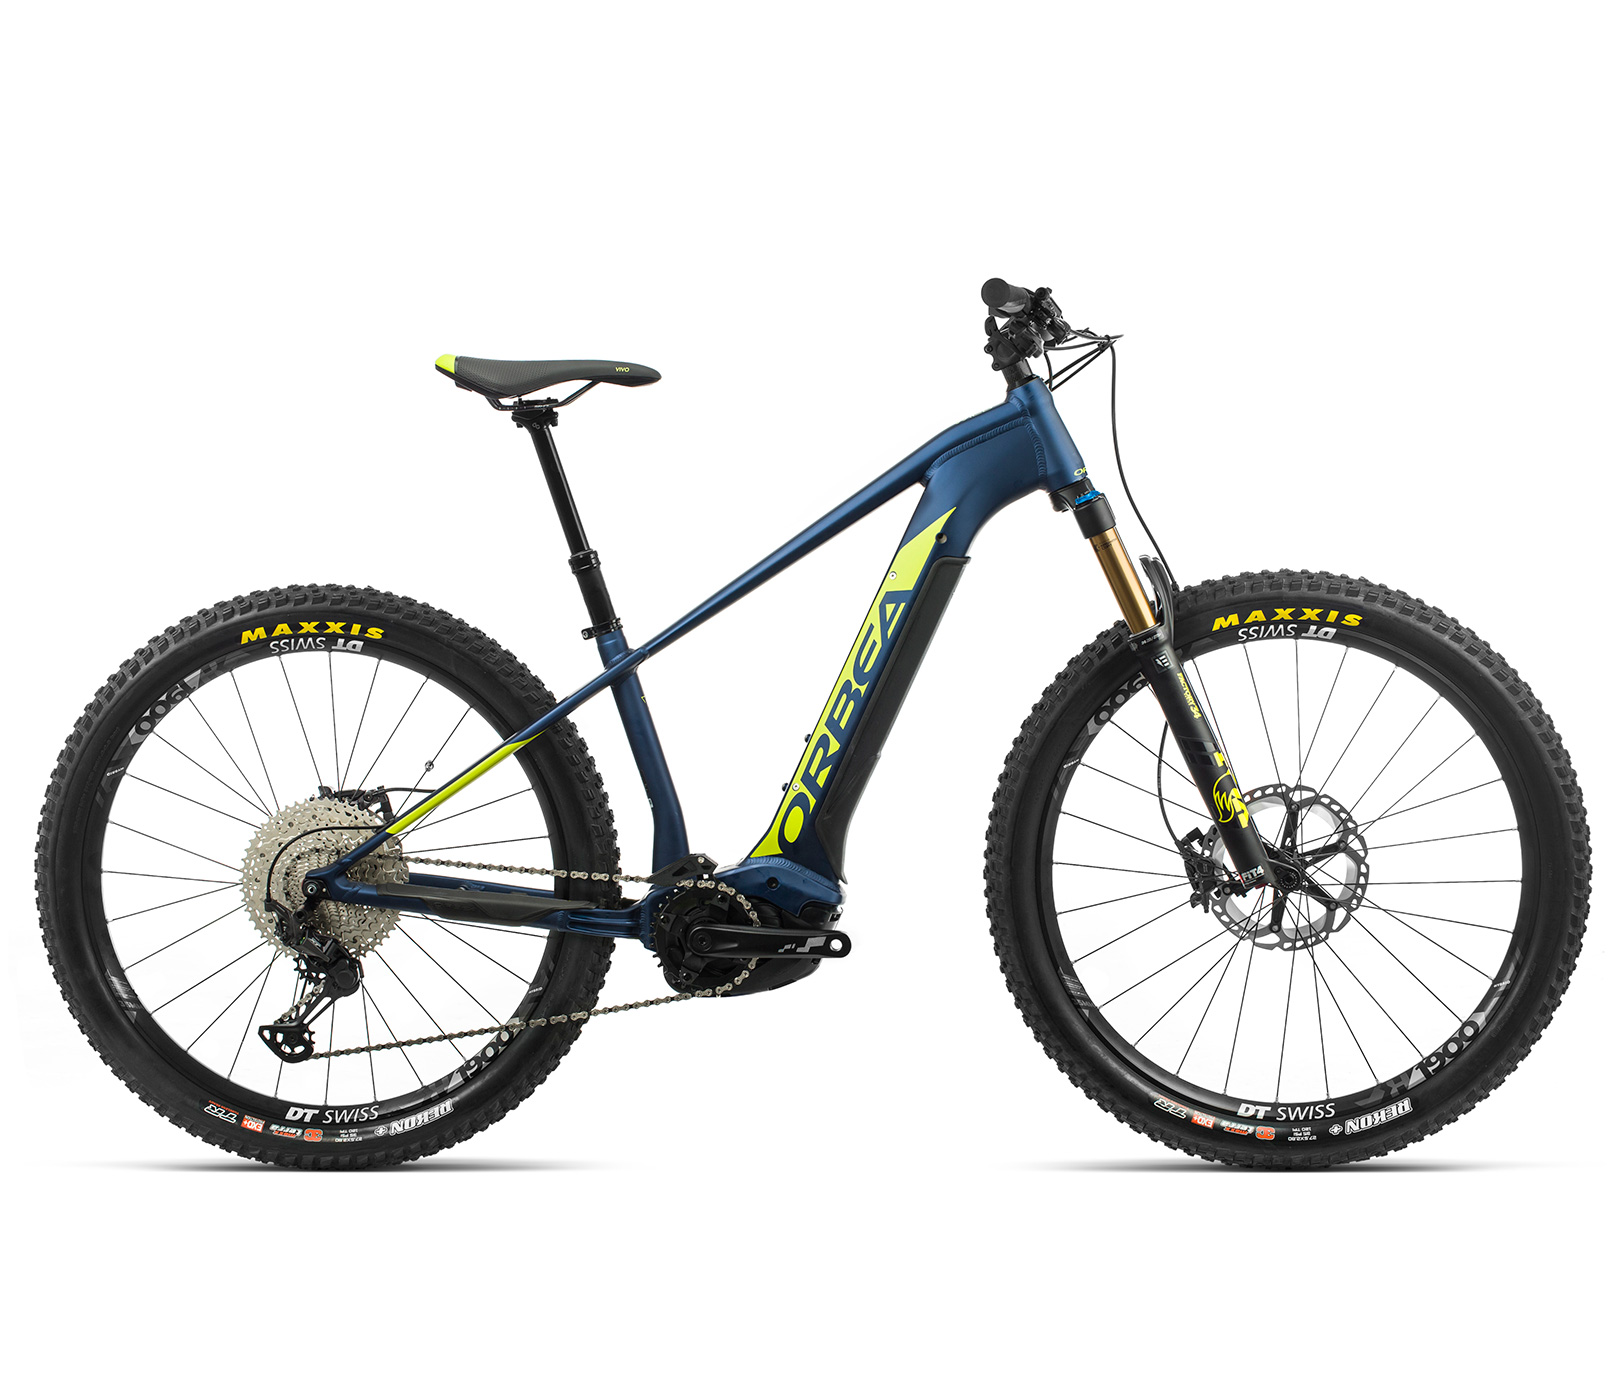 ORBEA WILD HT10 27 ebike - MARINE BLAUW MET / PISTACHE (DOF) @G-Bikes